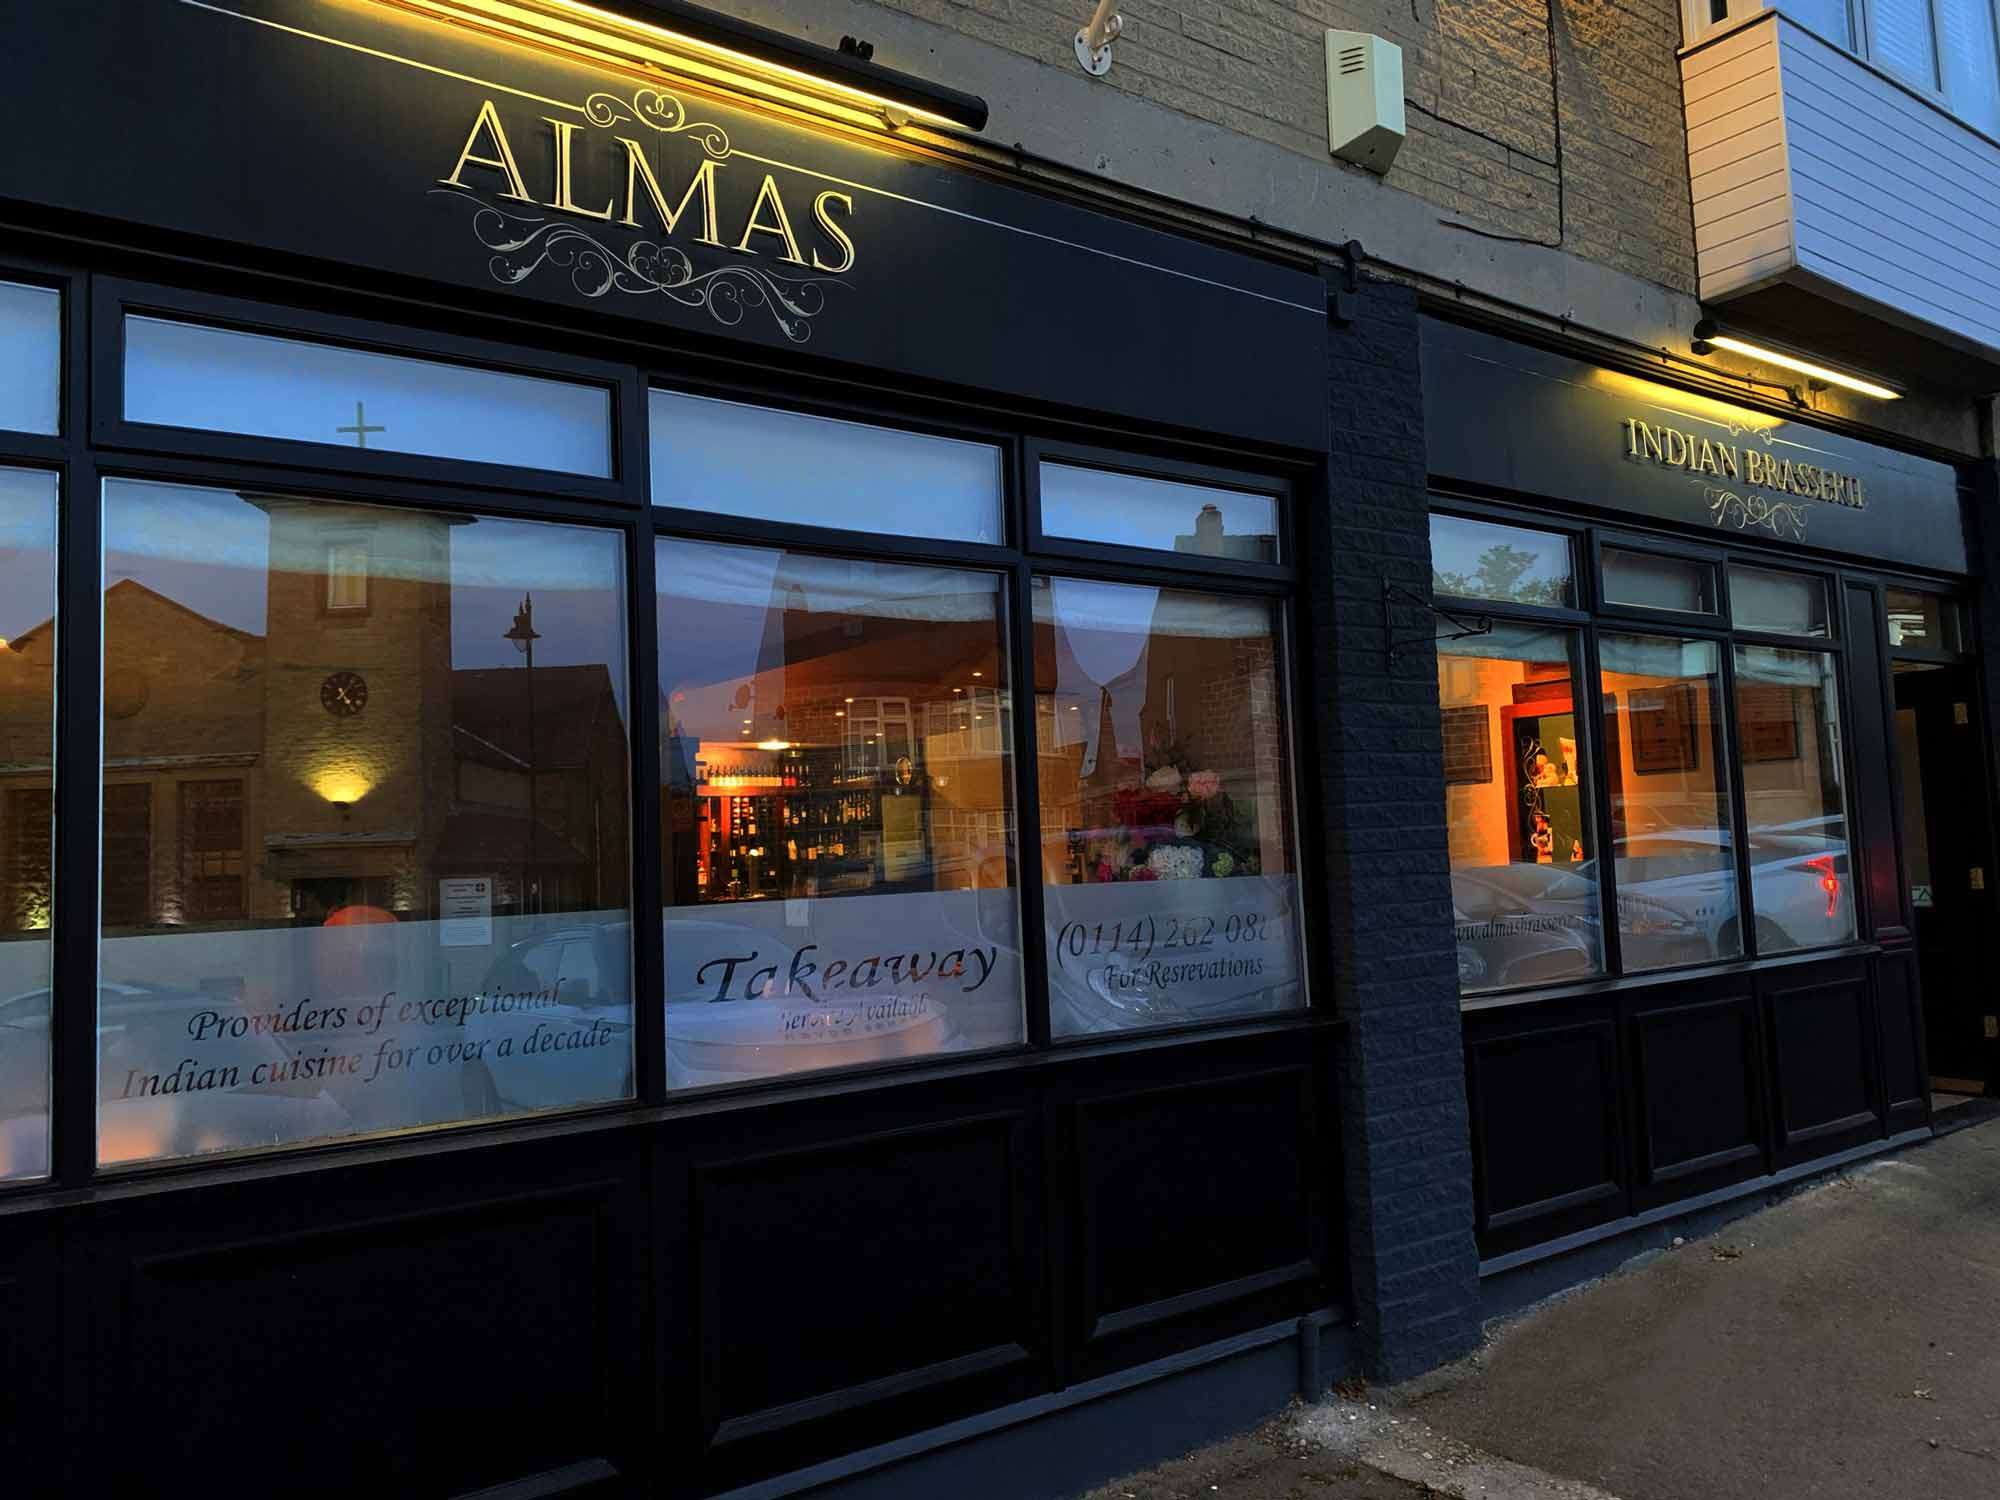 Almas Indian Brasserie